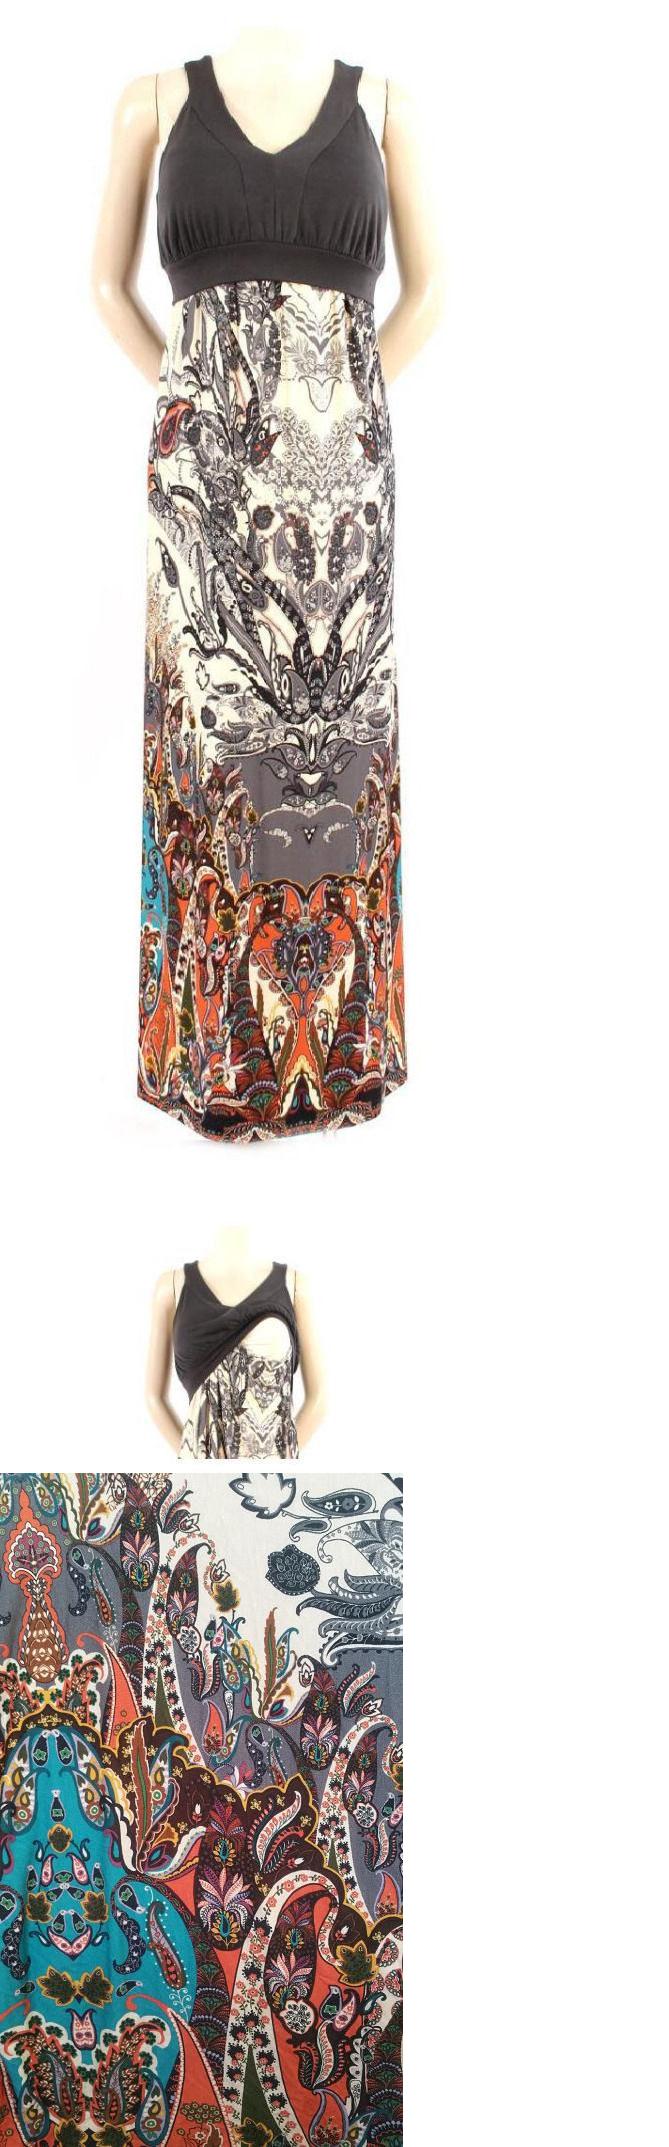 dresses 15752: new japanese weekend maternity nursing sleeveless